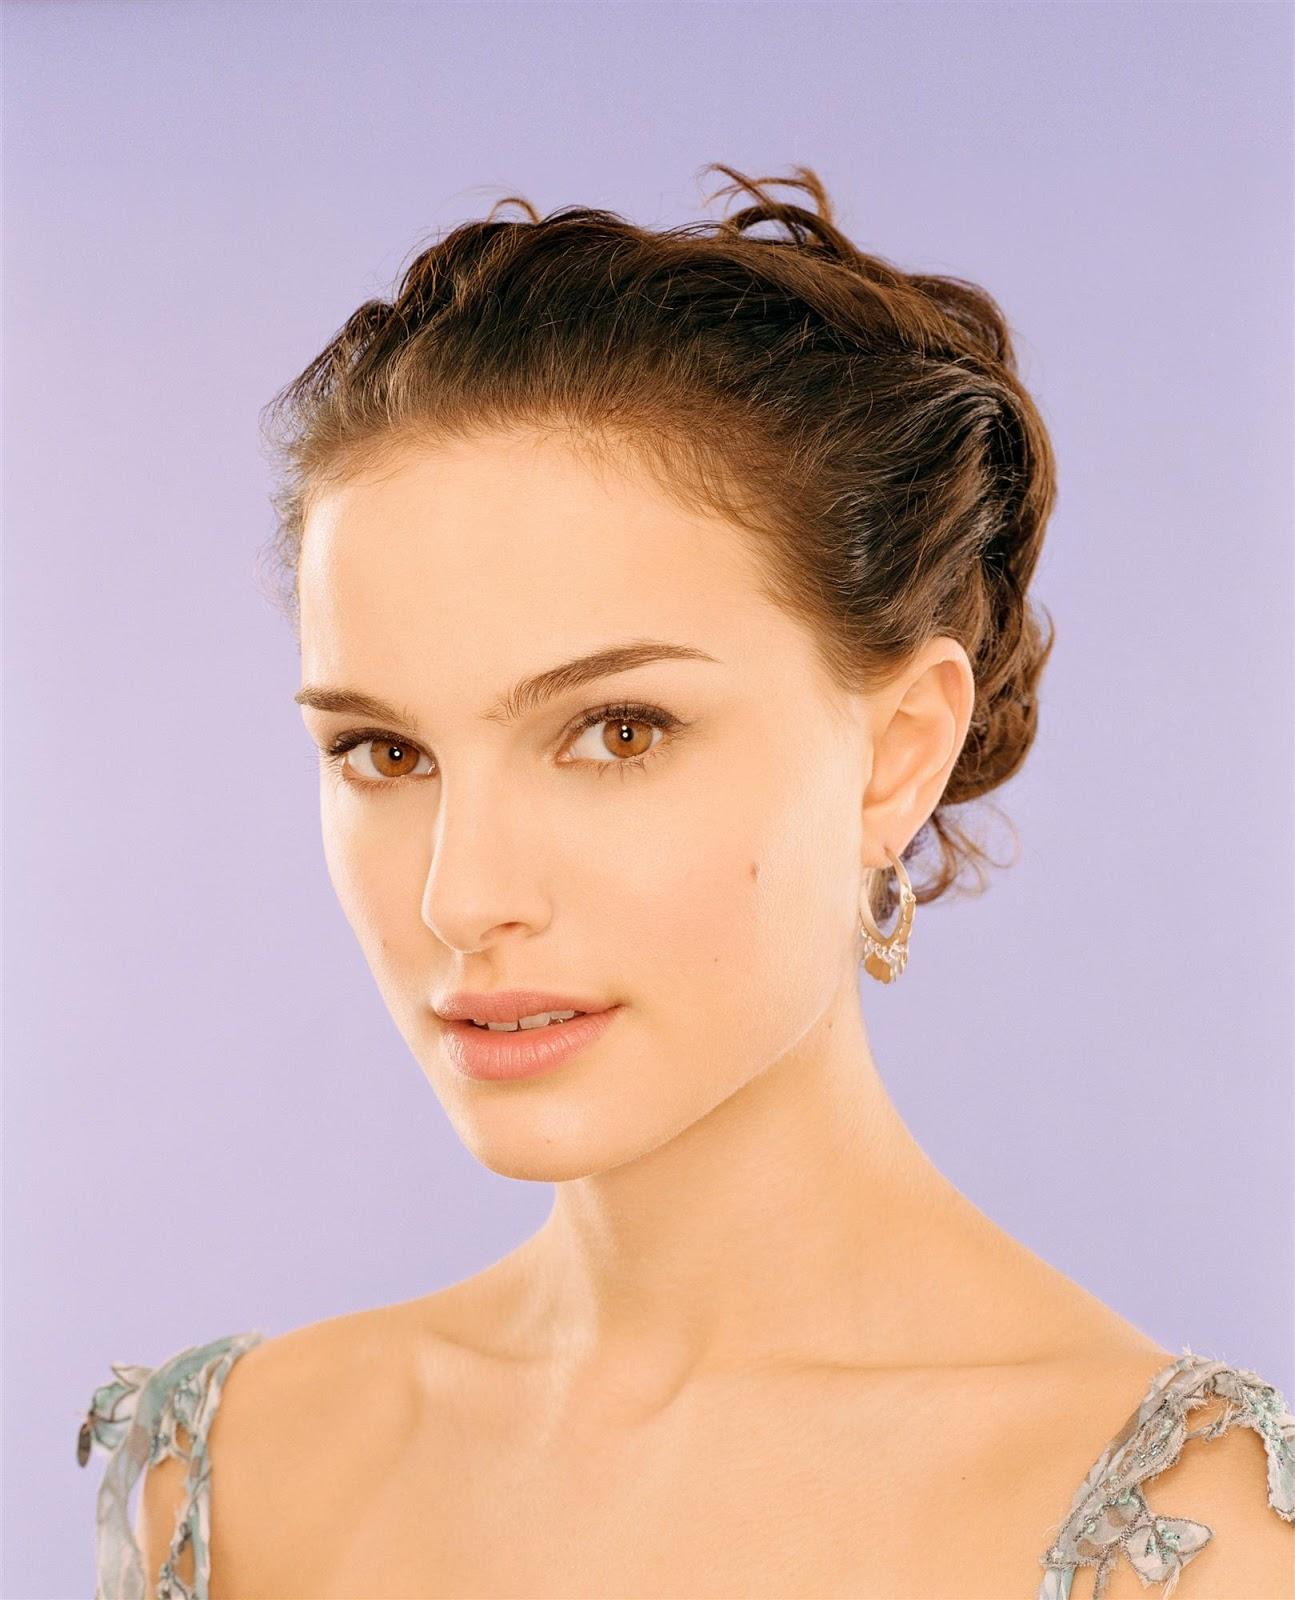 Natalie Portman Cute Andrew Macpherson Photoshoot Natalie Portman